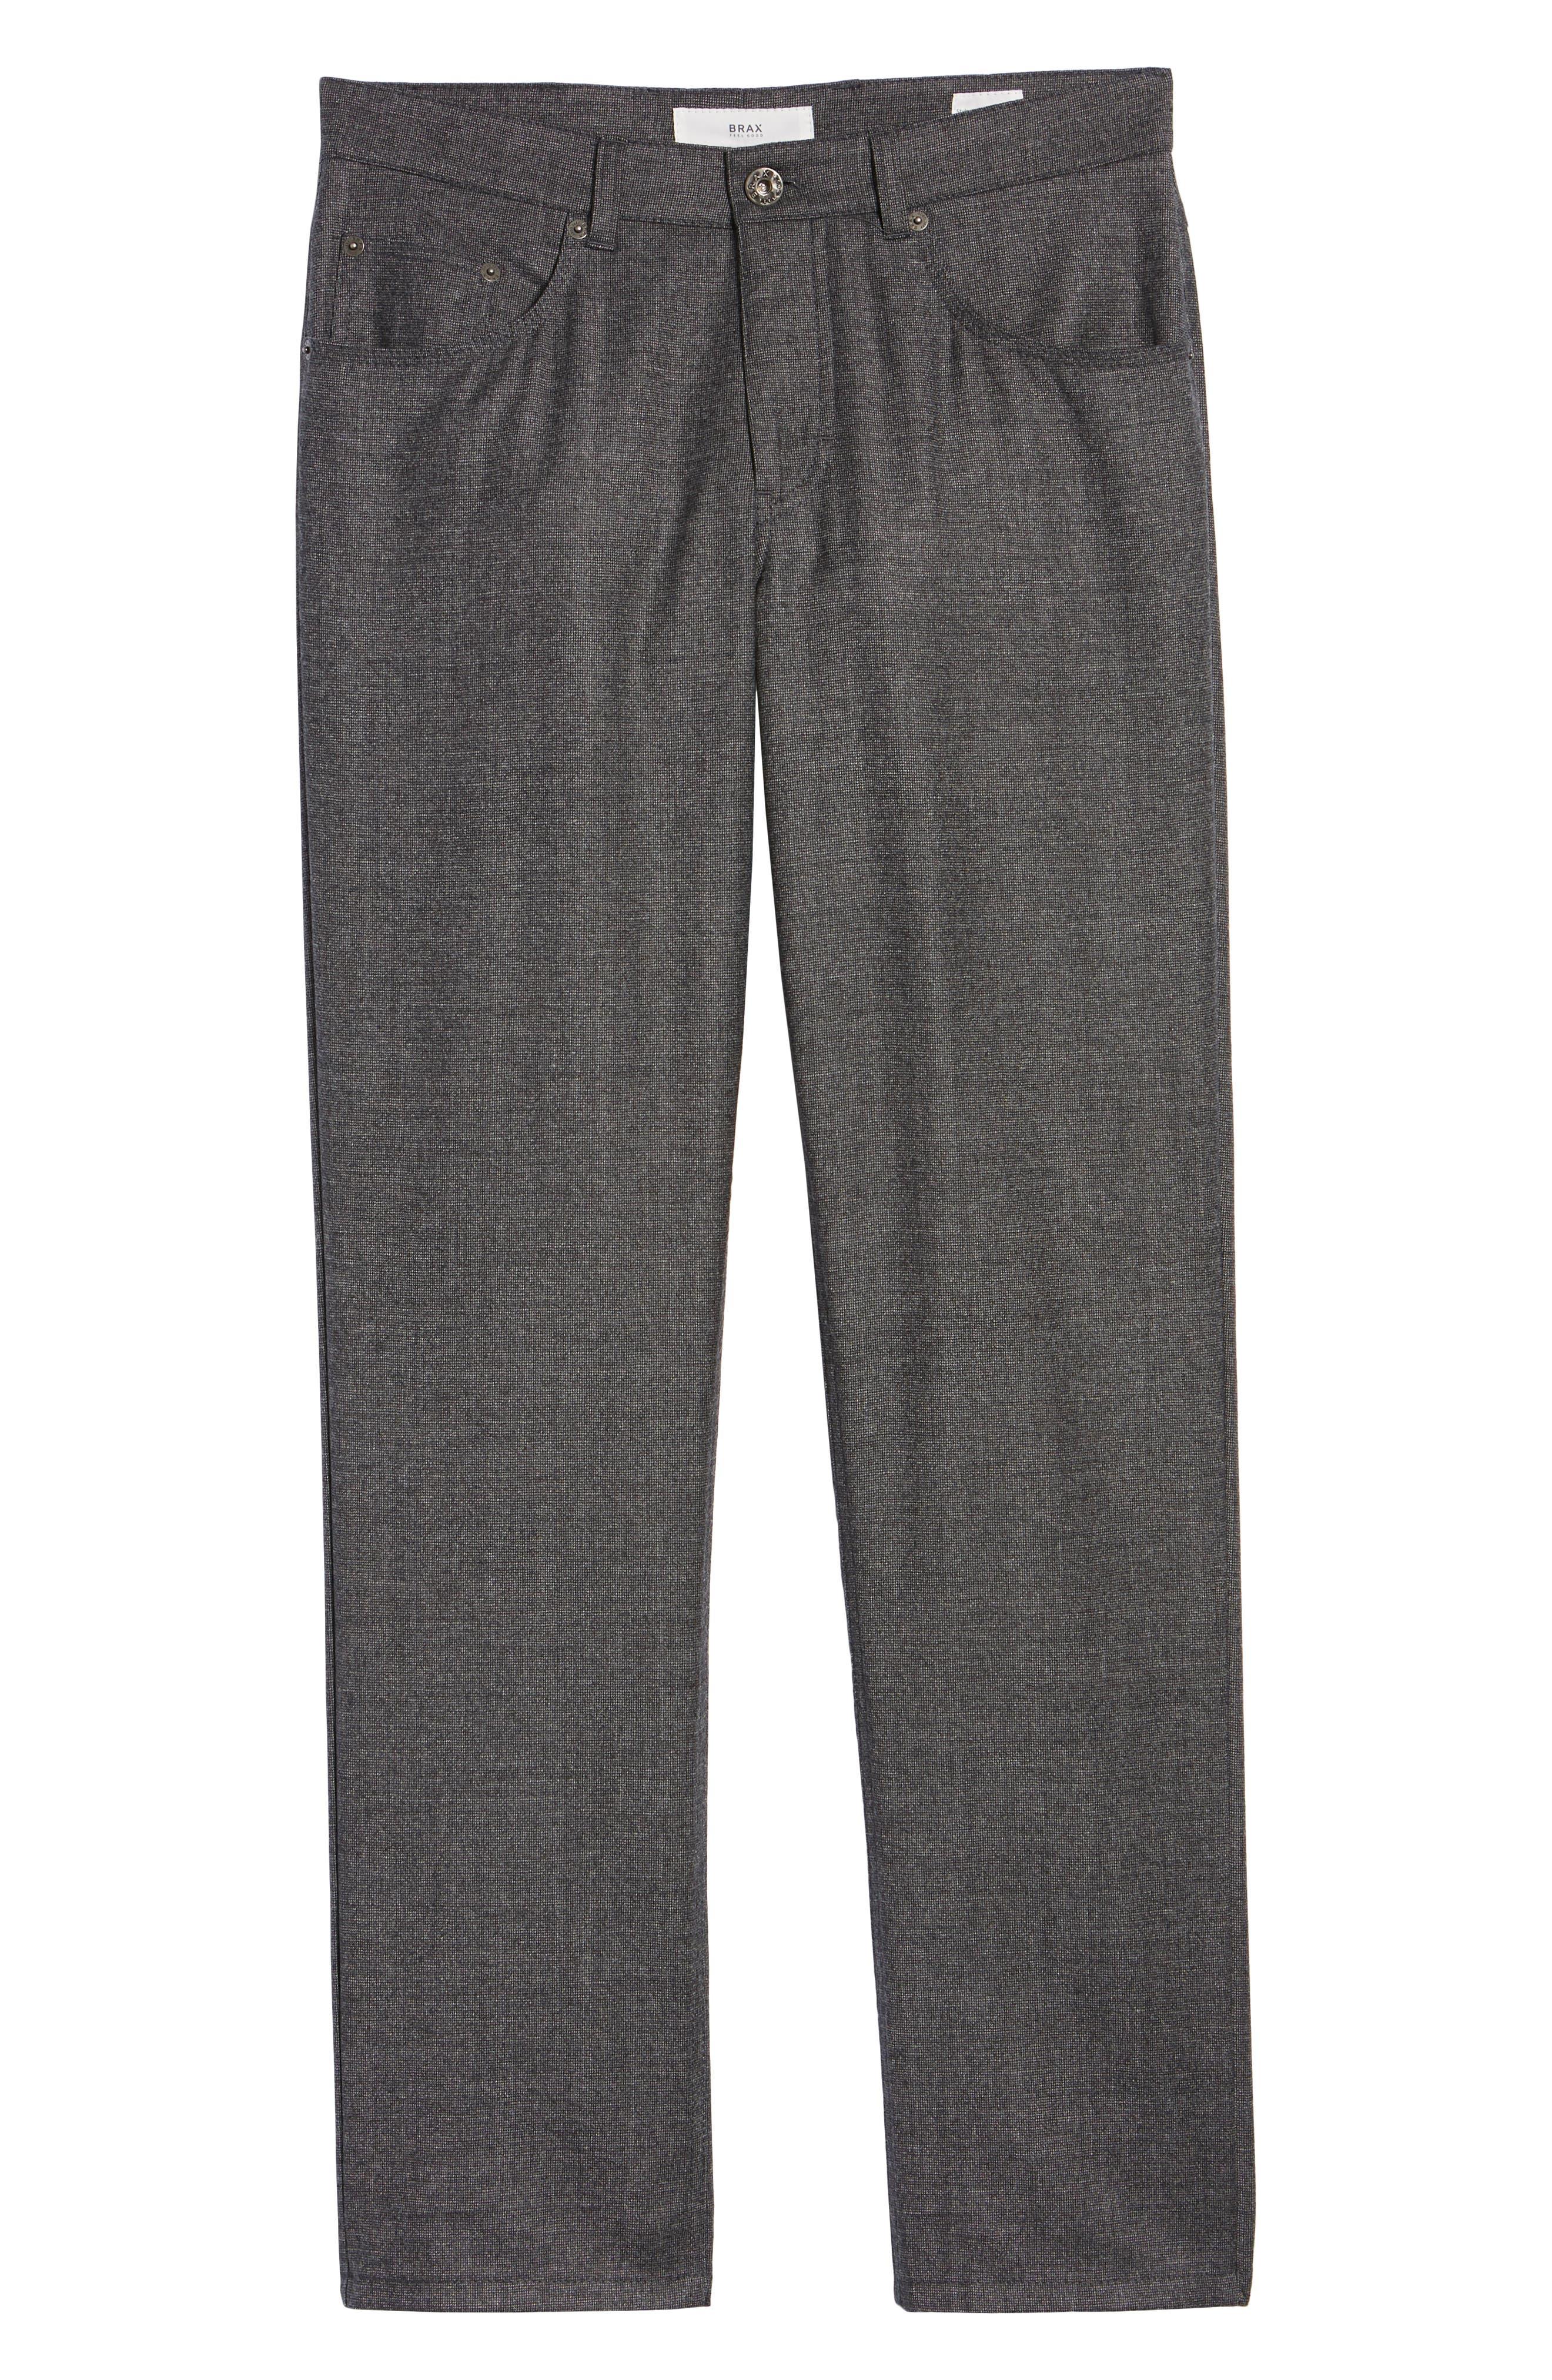 Cadiz Five Pocket Stretch Wool Trousers,                             Alternate thumbnail 6, color,                             GRAPHITE